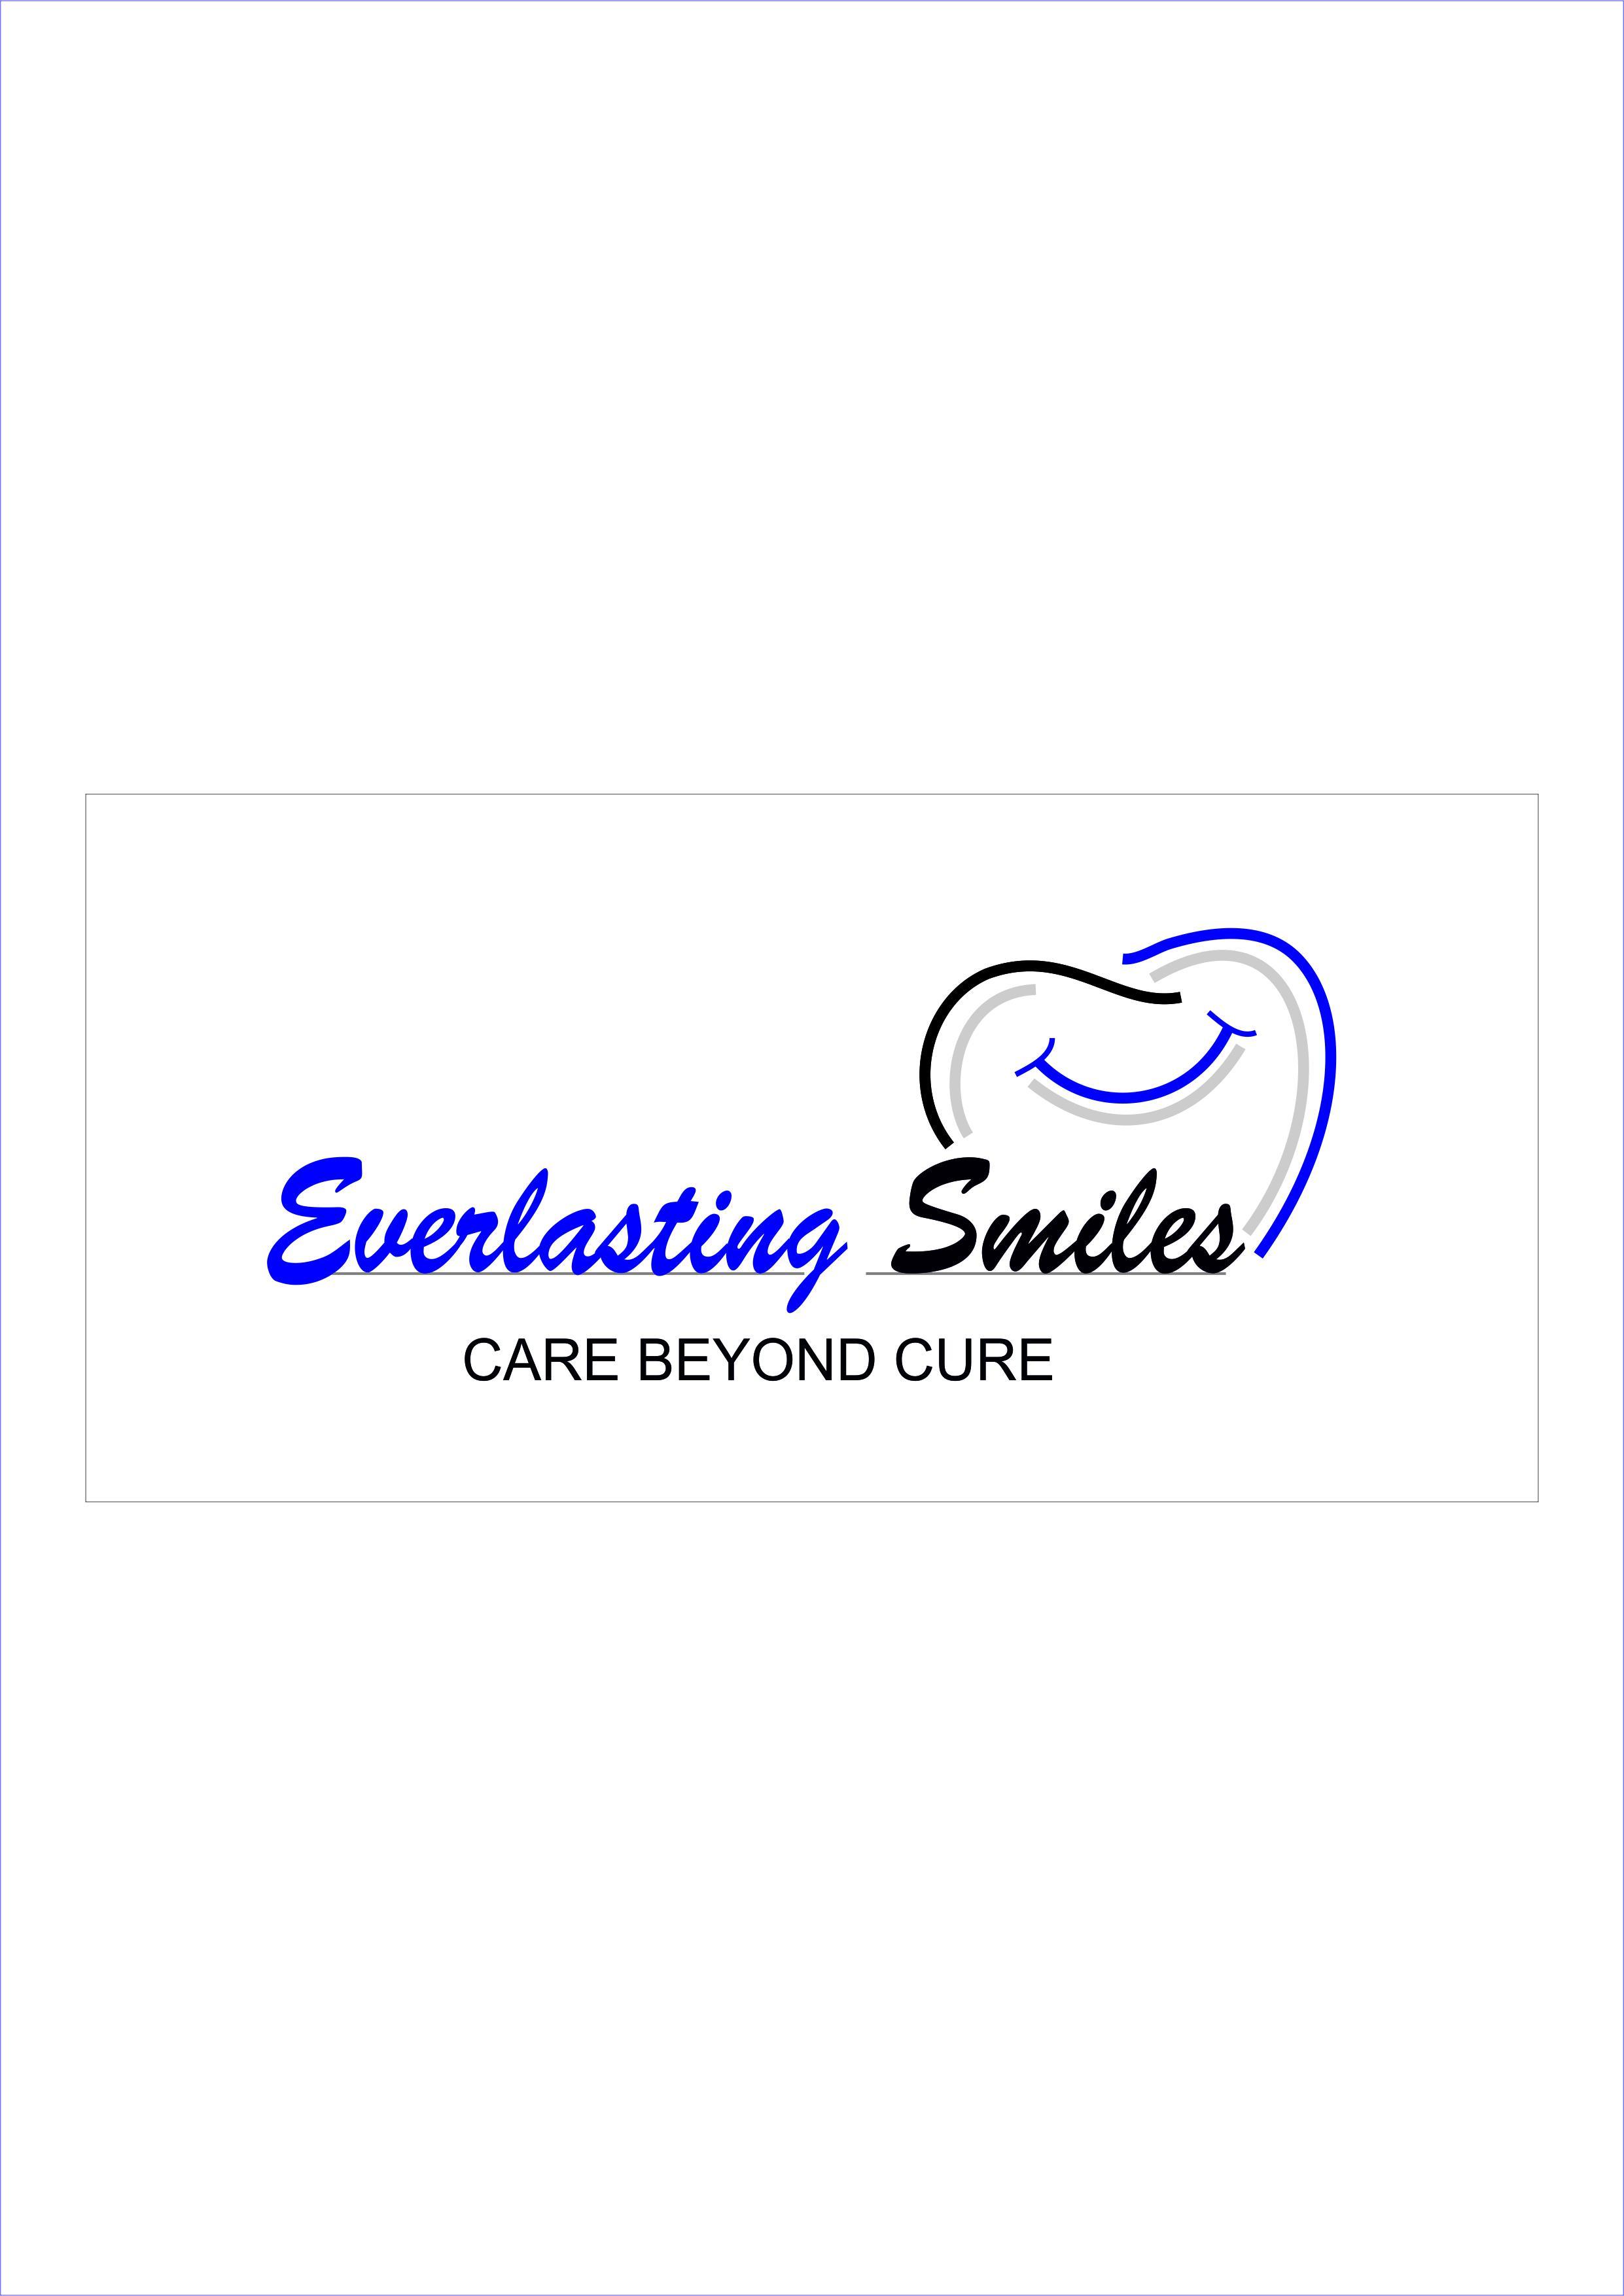 Everlasting Smiles